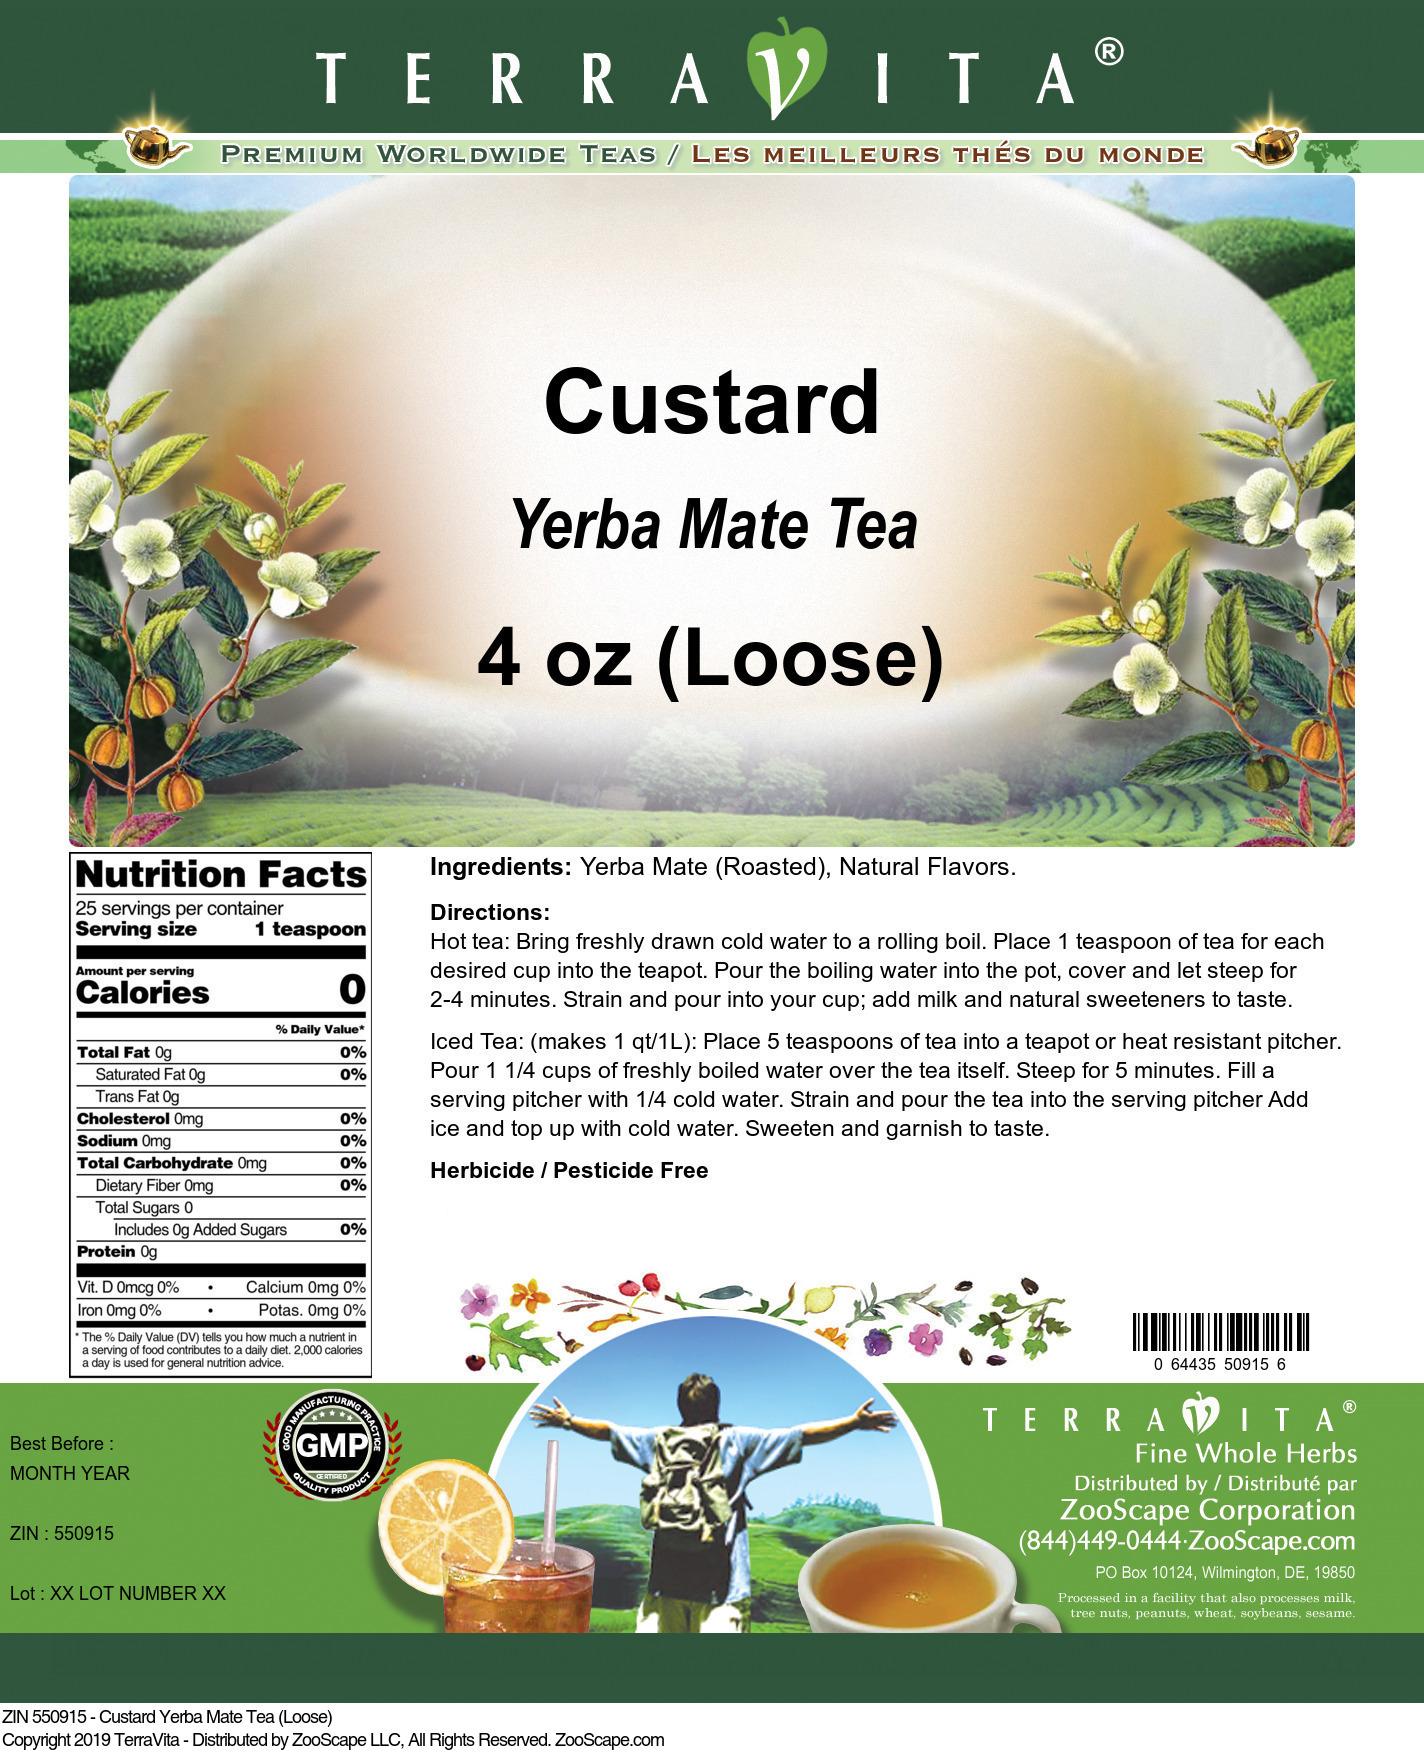 Custard Yerba Mate Tea (Loose)